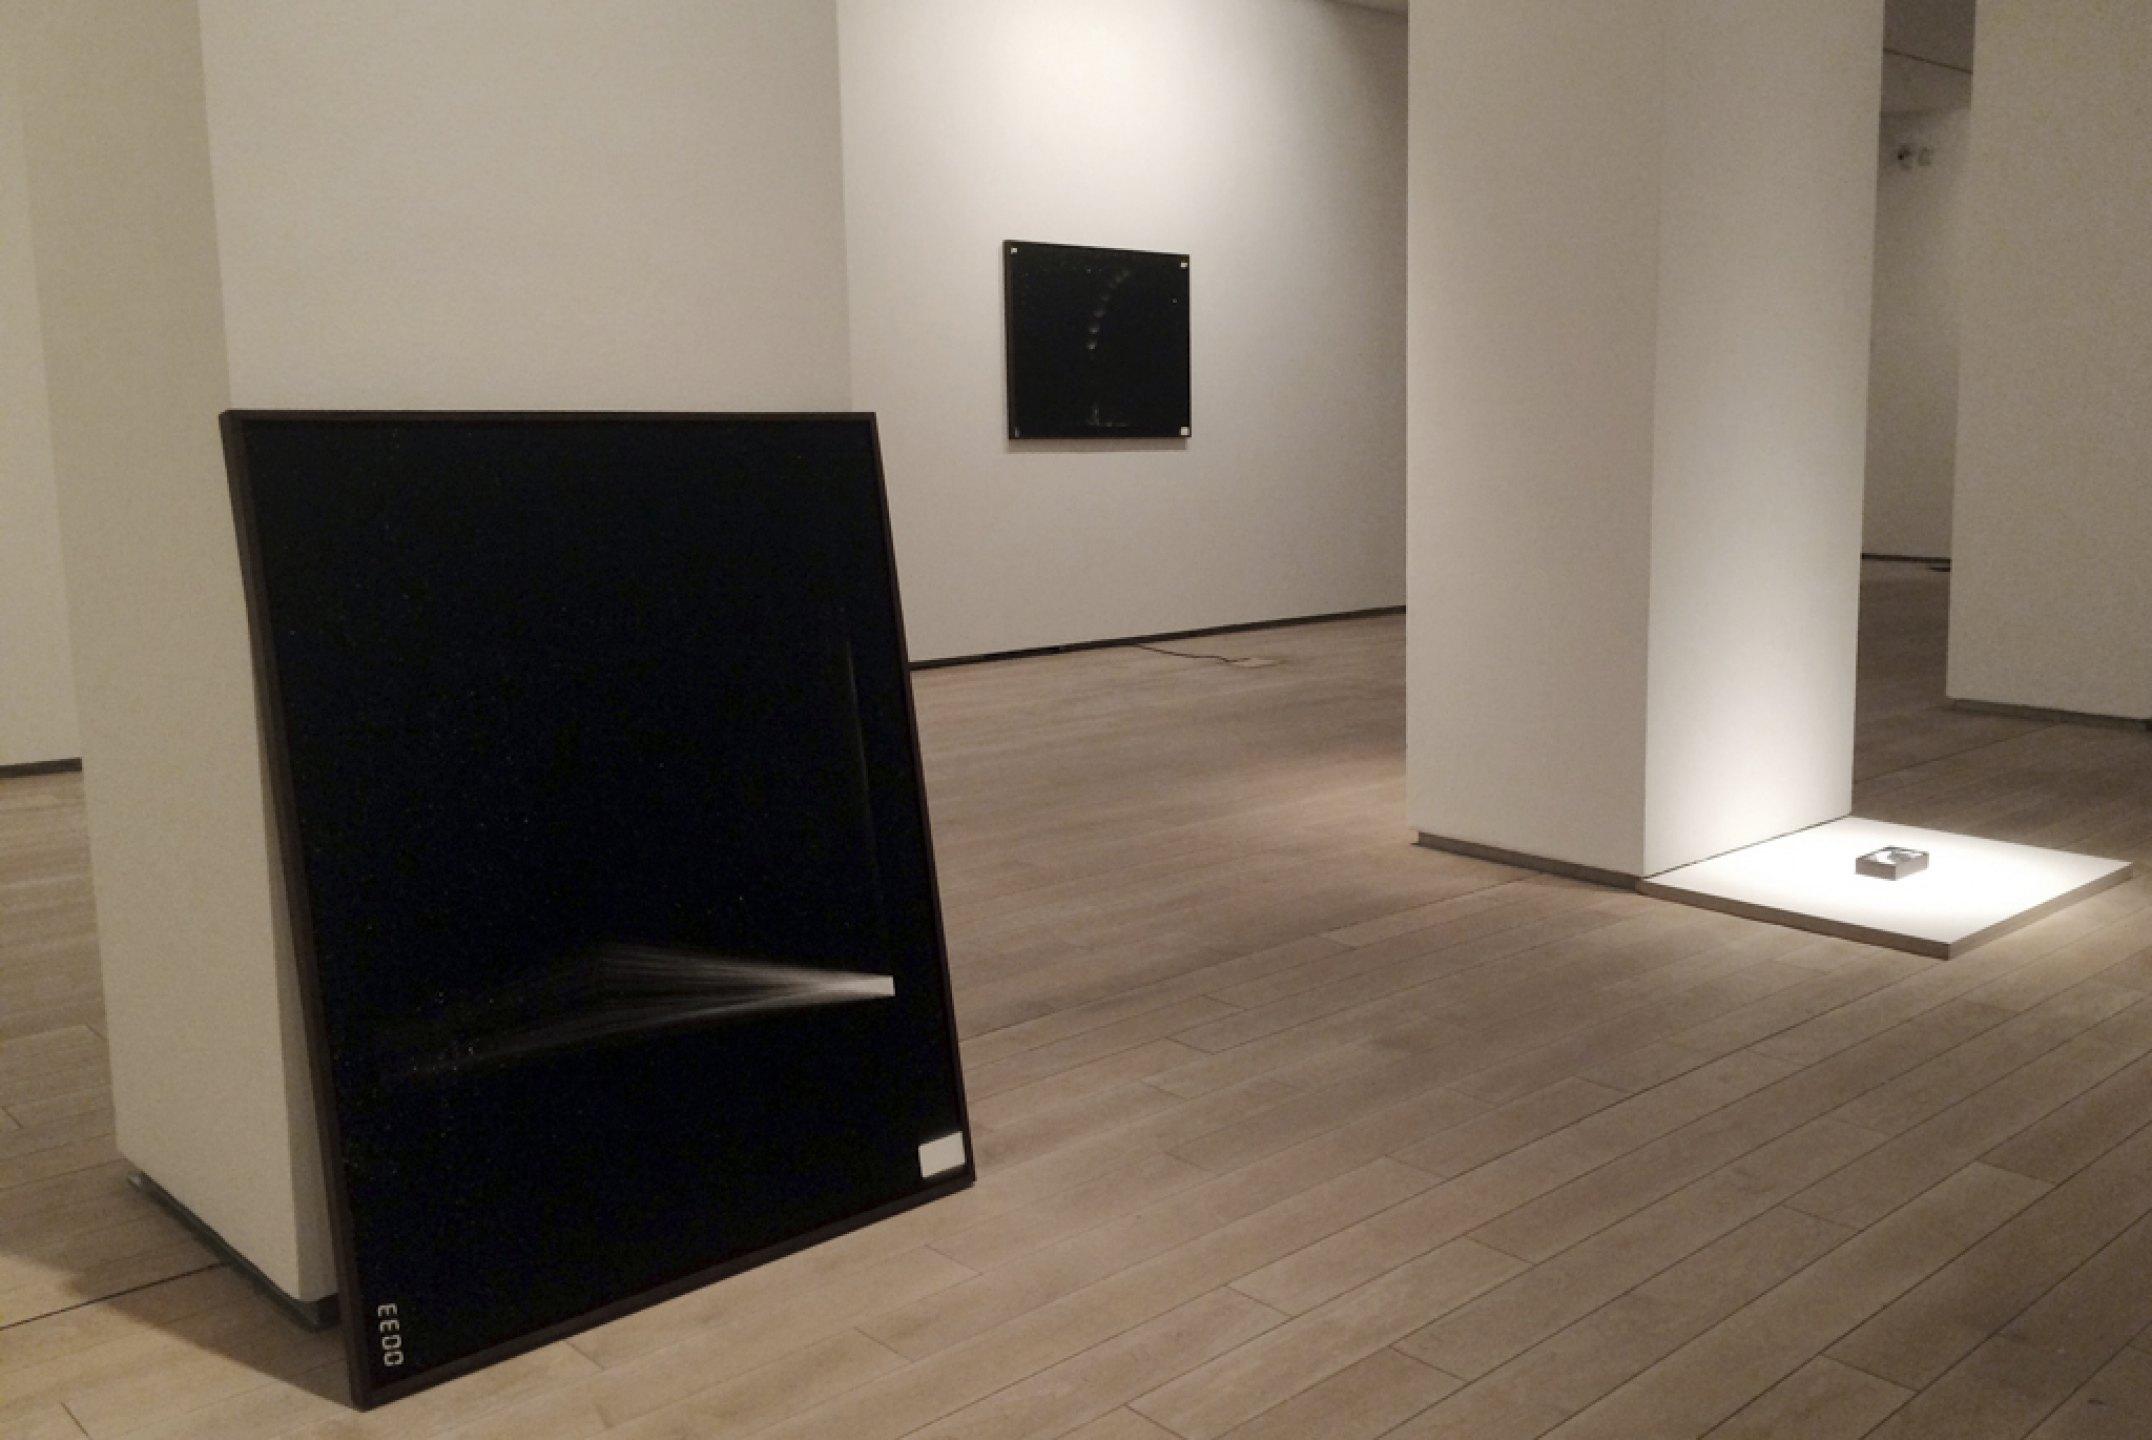 Leticia Ramos,<em>HISTÓRIA UNIVERSAL DOS TERREMOTOS,</em>Itinerarios XXIII,Fundación Botín, Santander, 2017 - Mendes Wood DM